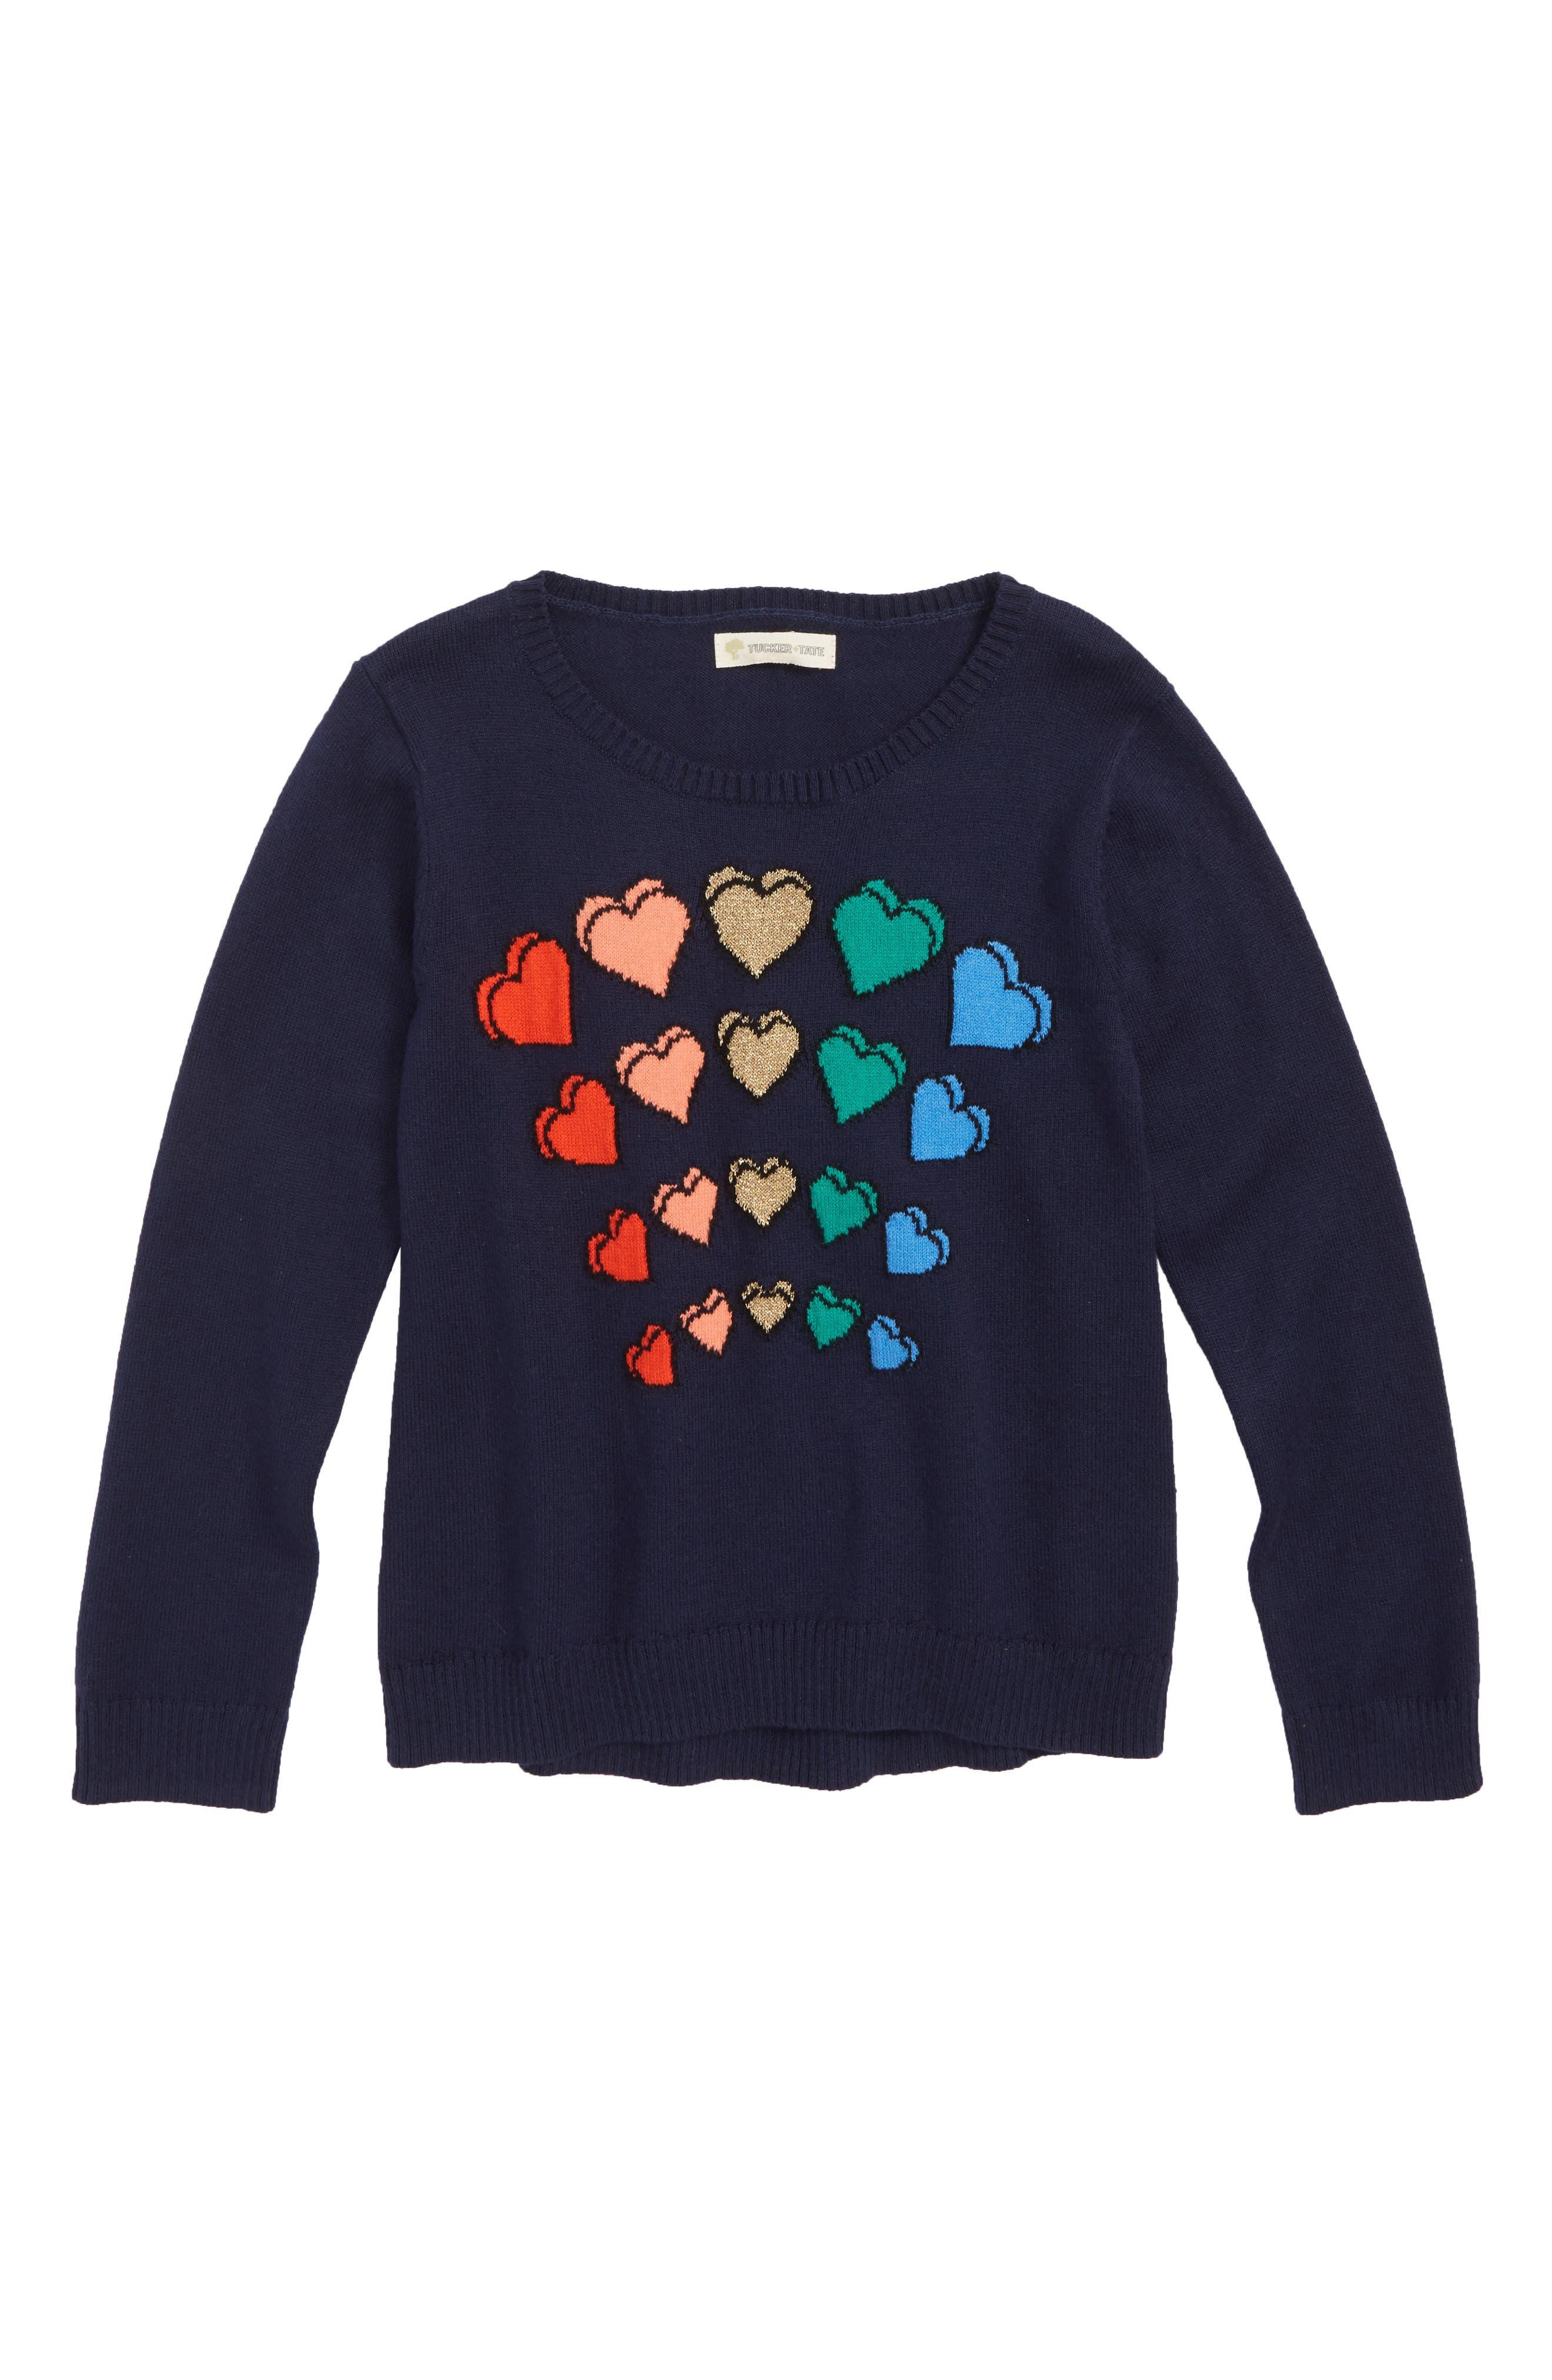 TUCKER + TATE, Sparkle Heart Sweater, Main thumbnail 1, color, 410